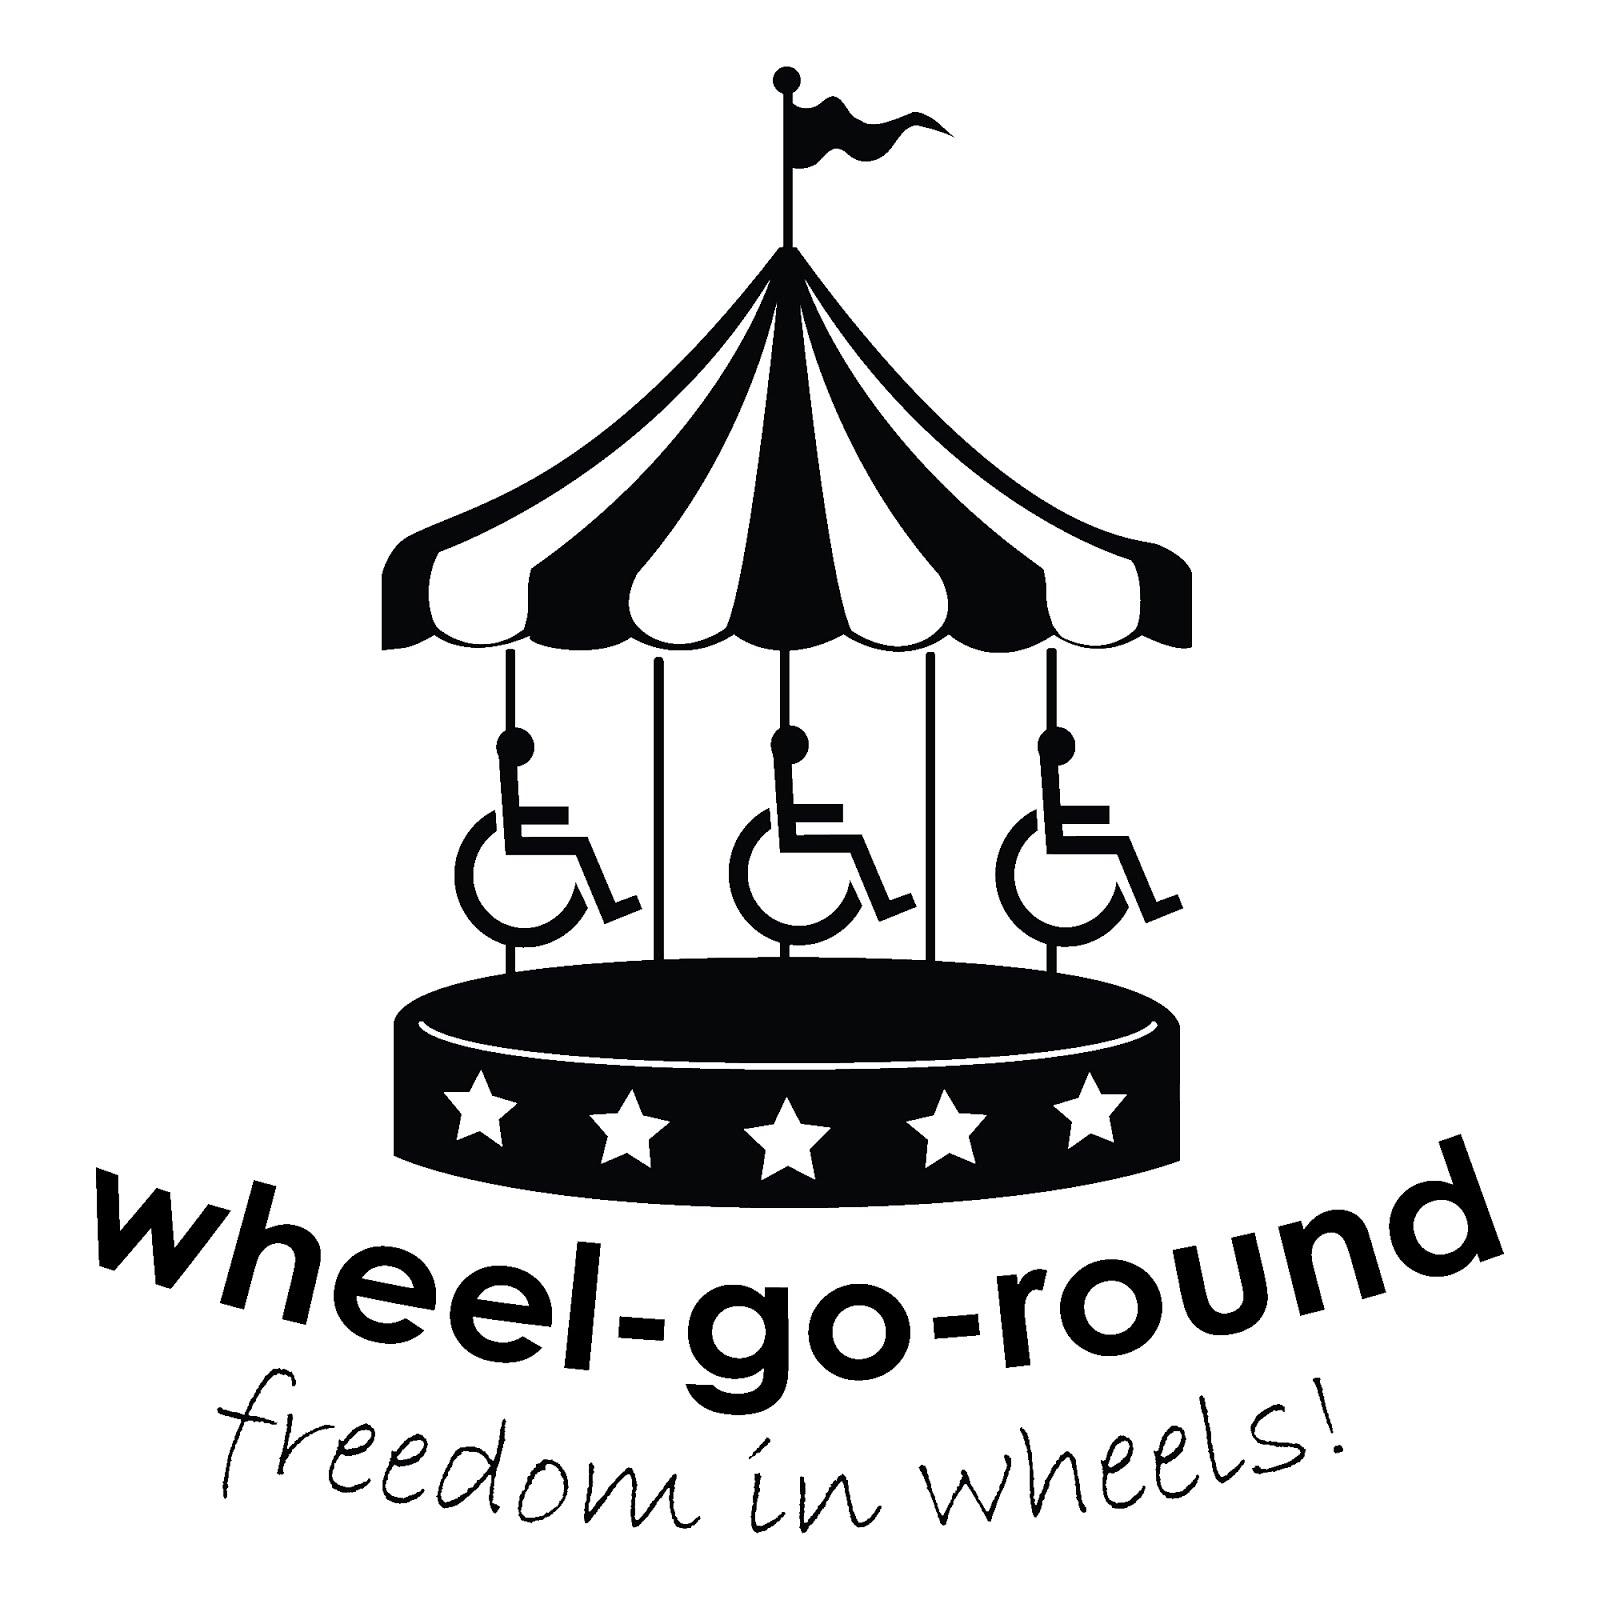 wheel-go-round_logo.jpg